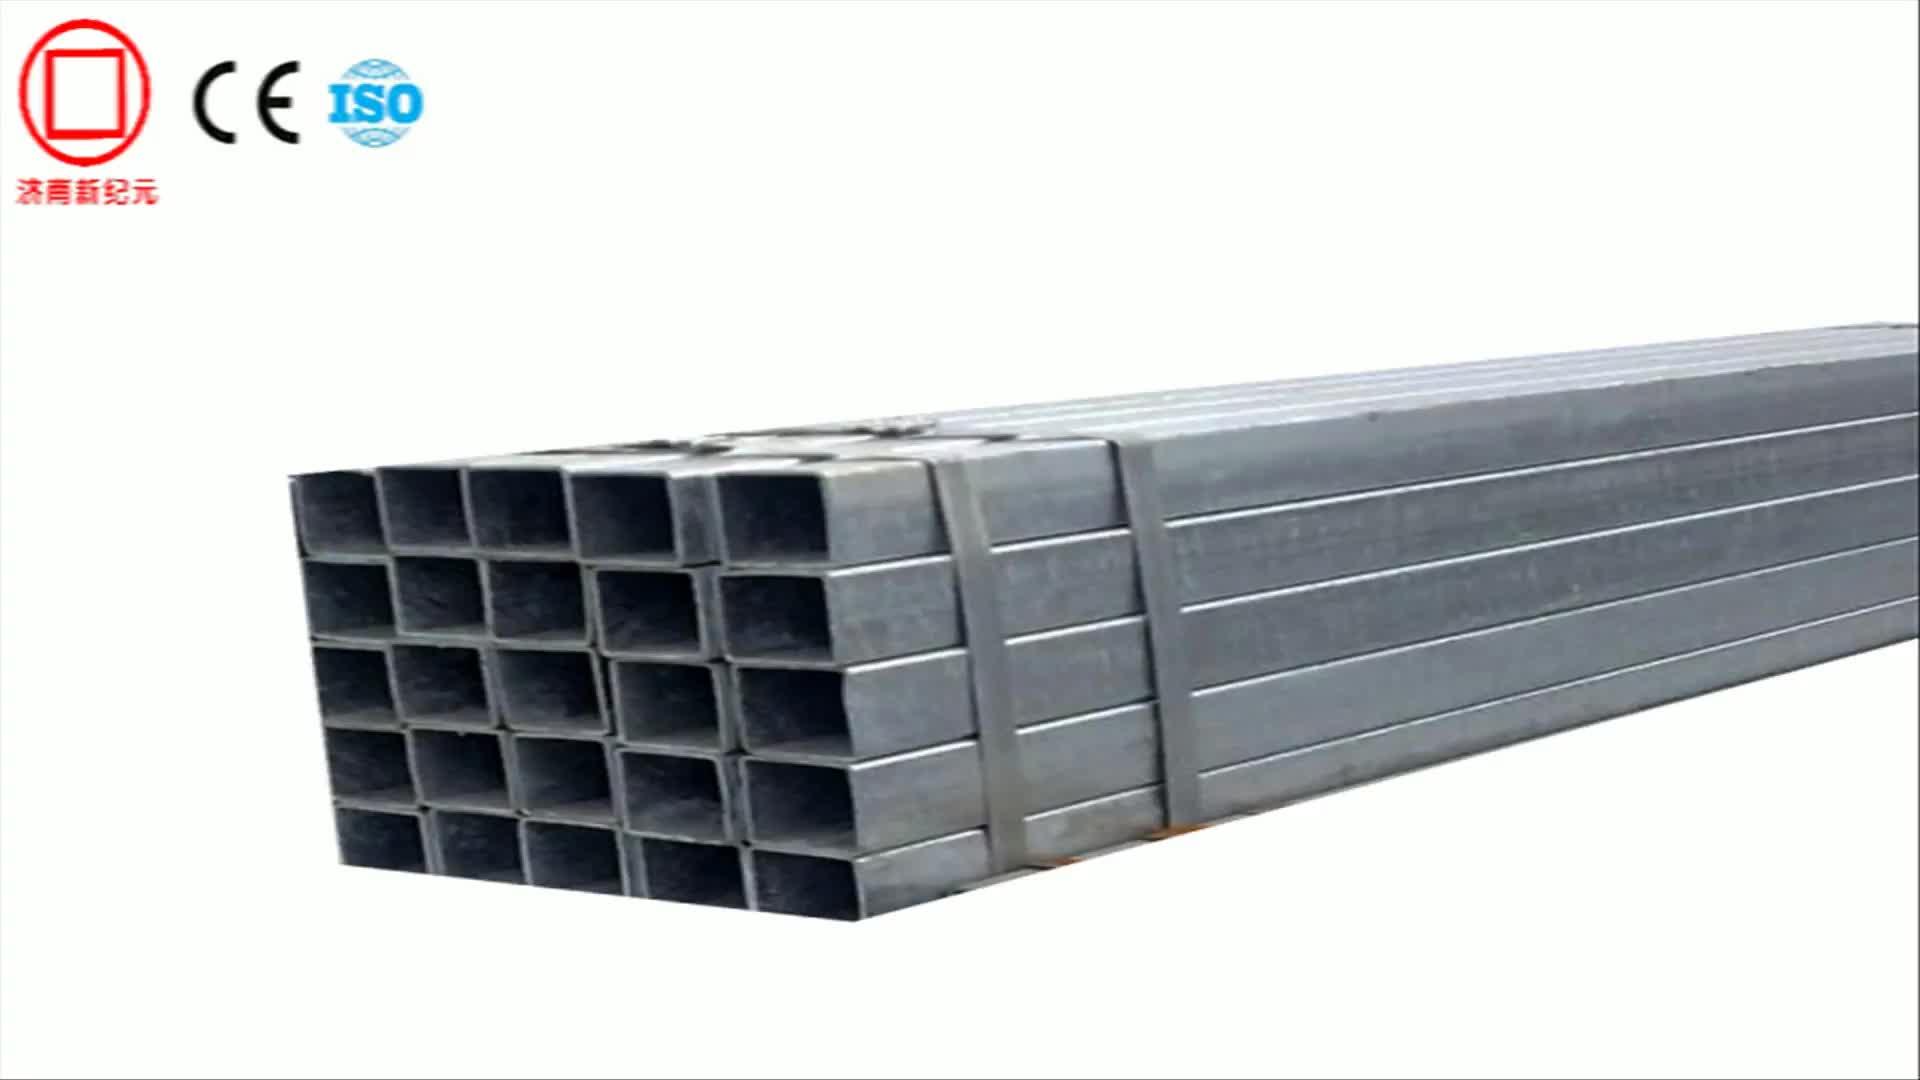 Standard square pipe large diameter galvanized steel rectangular tube on sale